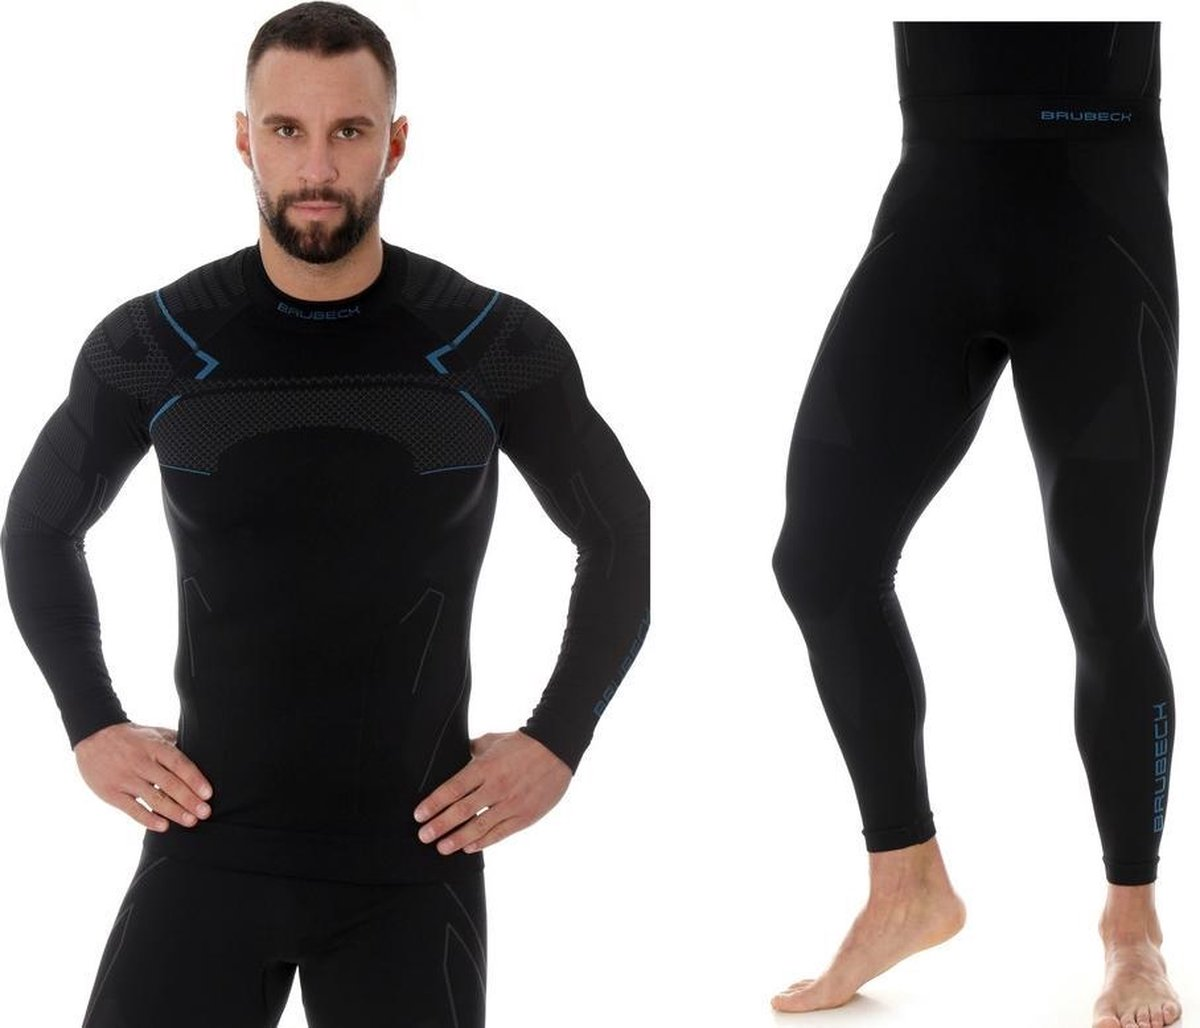 Brubeck Heren Thermokleding Set - met Nilit® Heat - Zwart/Blauw - M